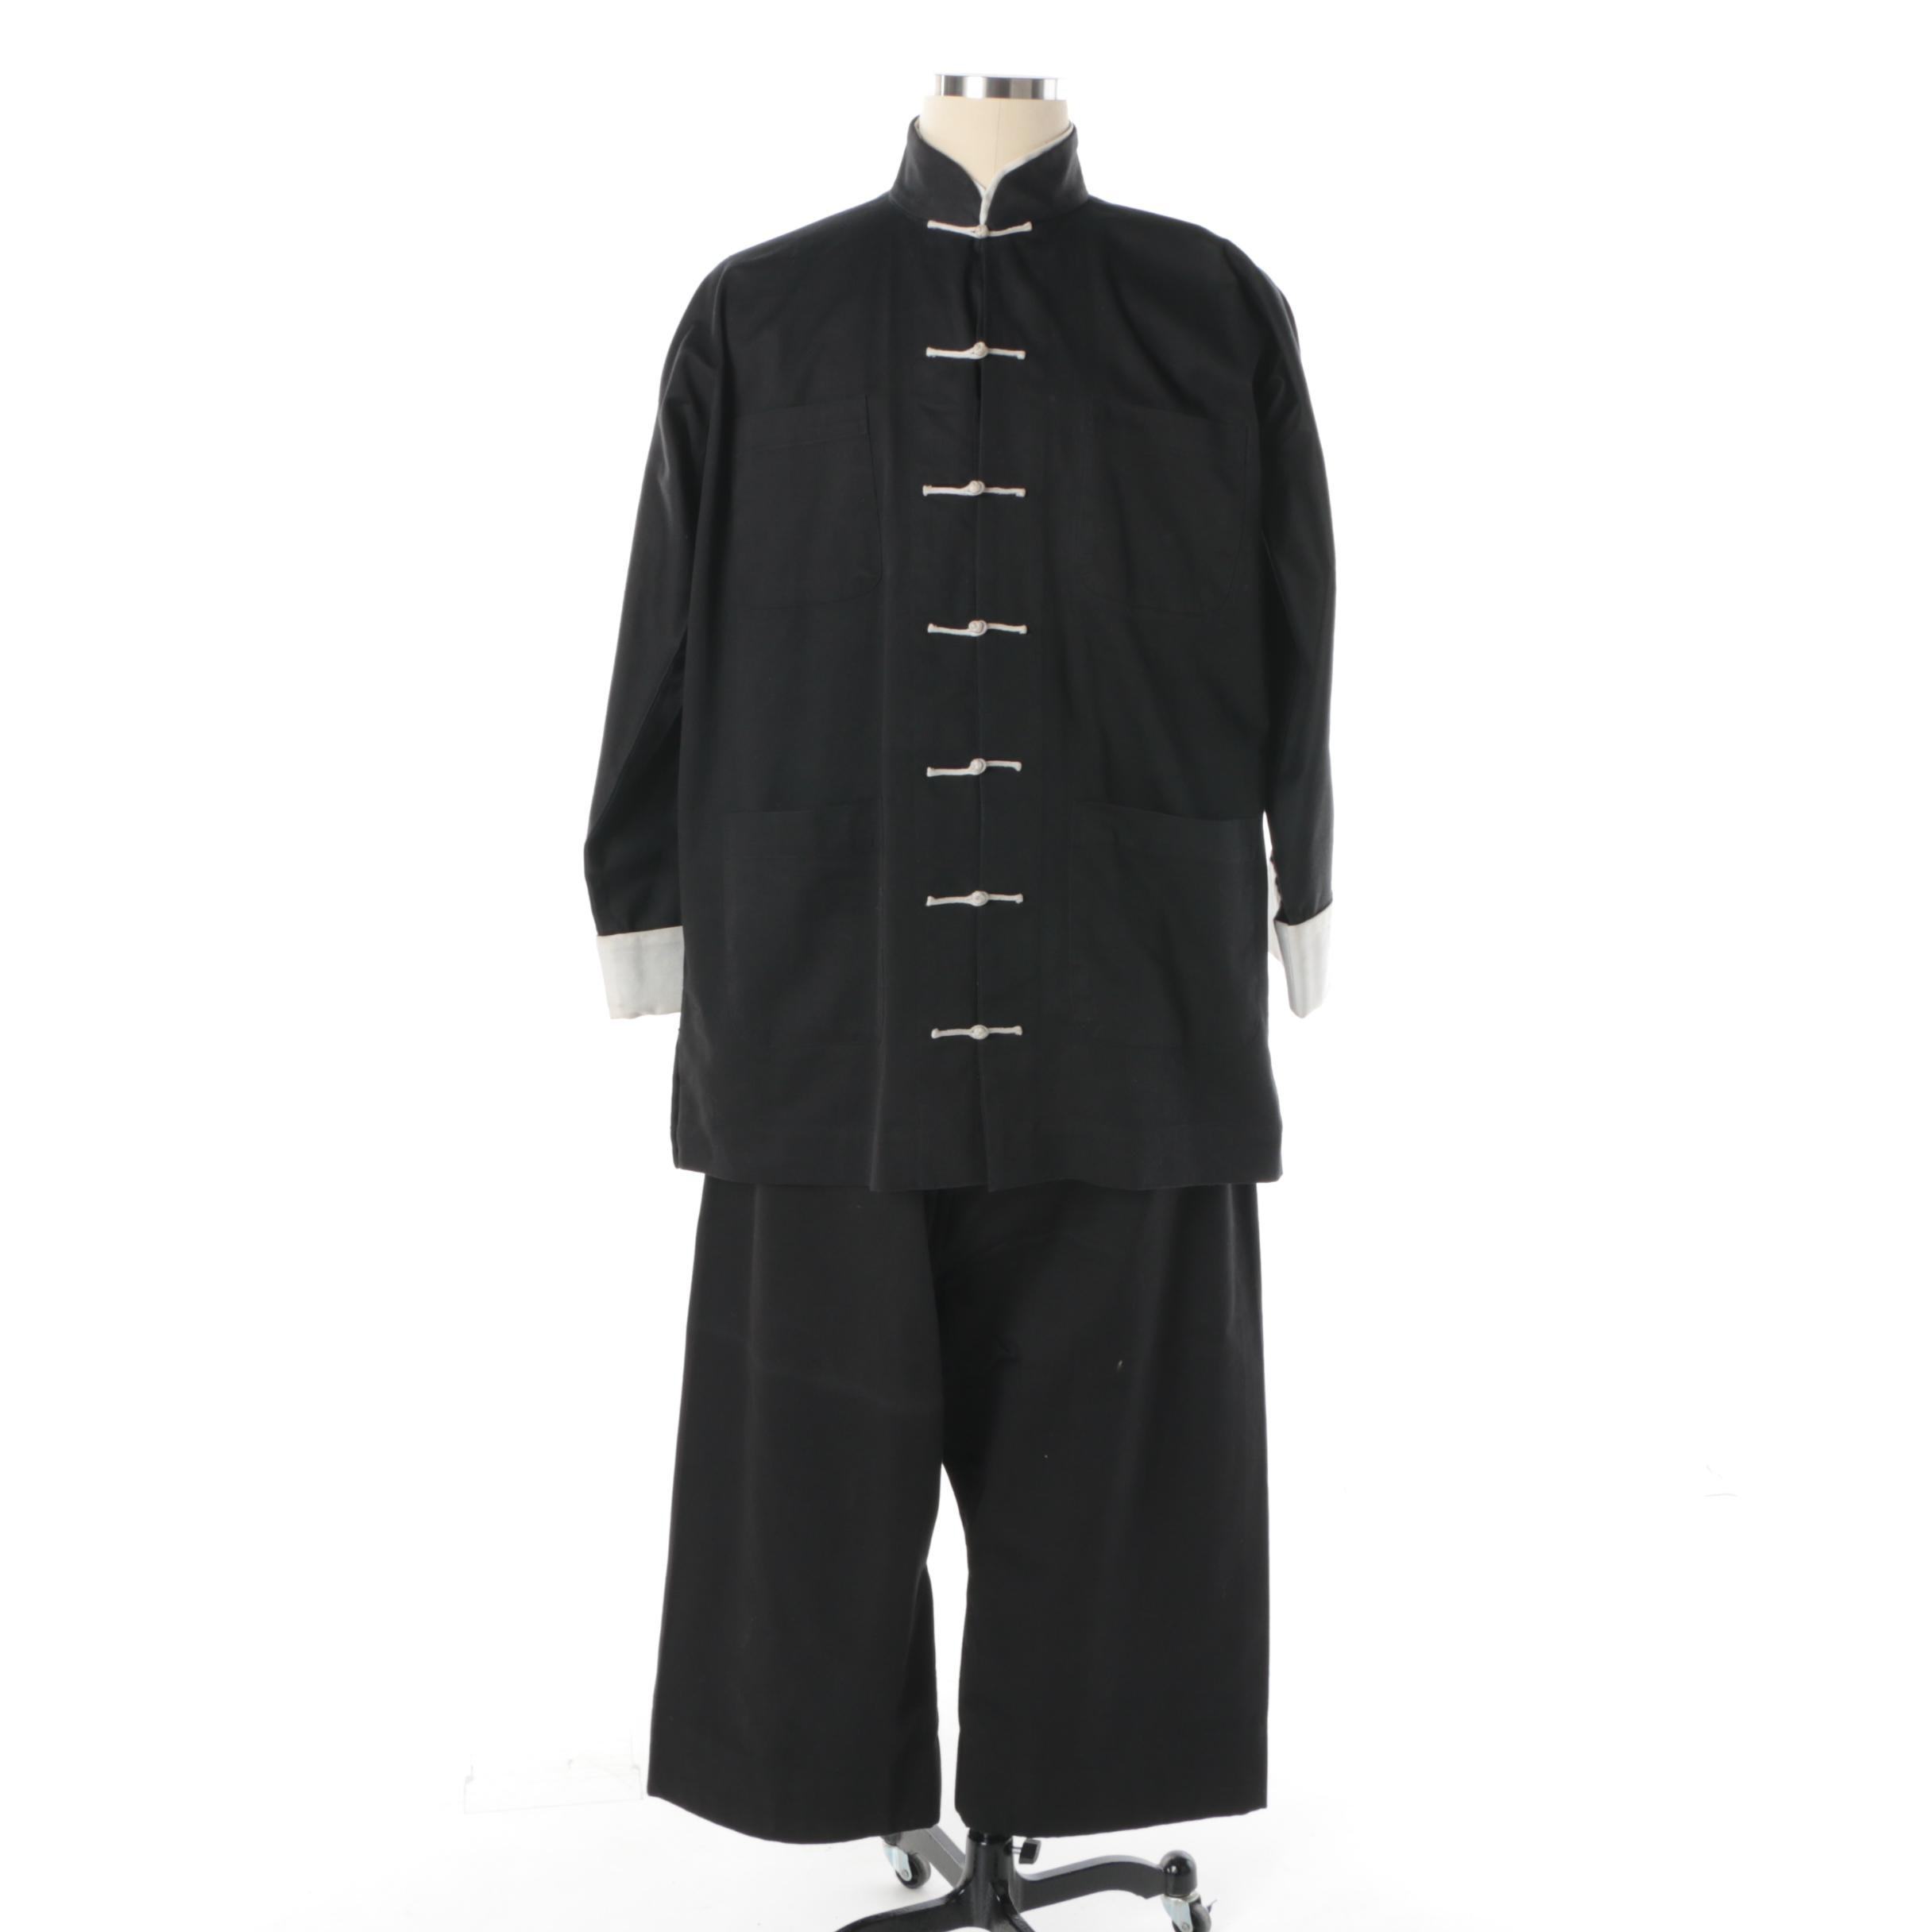 Men's Vintage Eagle Black and White Cotton Chinese Style Ensemble